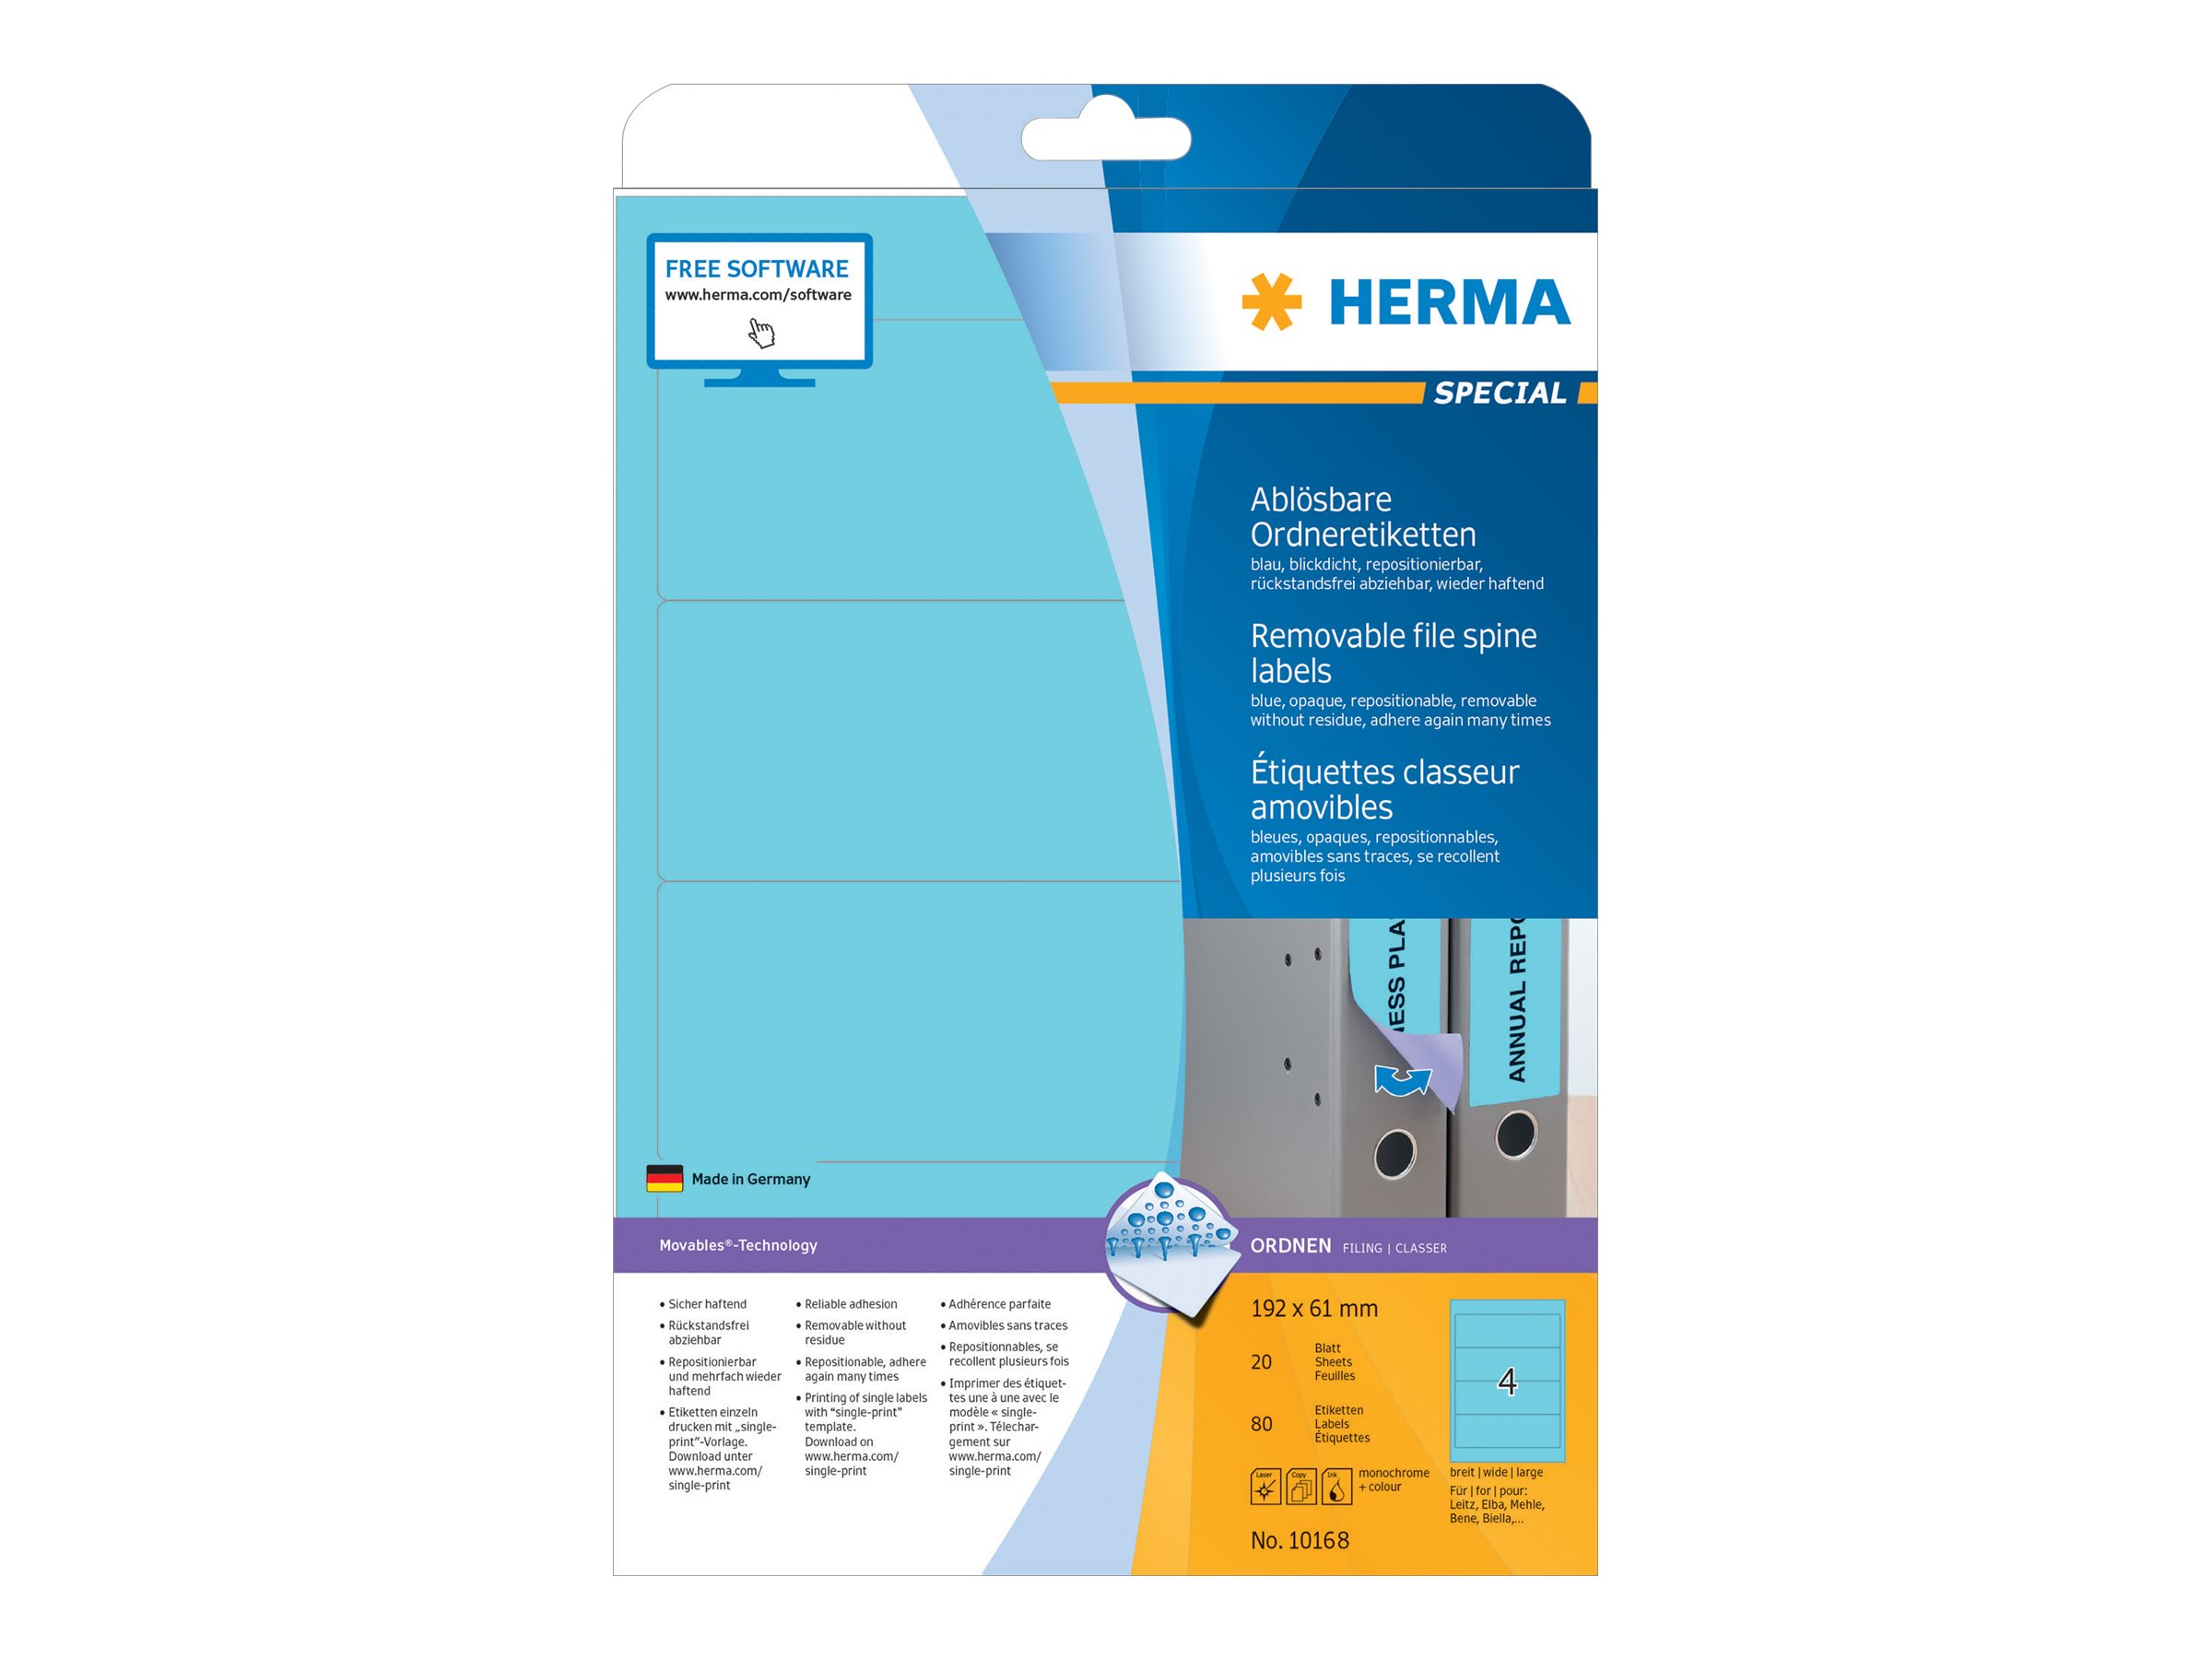 HERMA Special - Papier - matt - selbstklebend, entfernbarer Klebstoff - Blau - 192 x 61 mm 80 Etikett(en) (20 Bogen x 4)